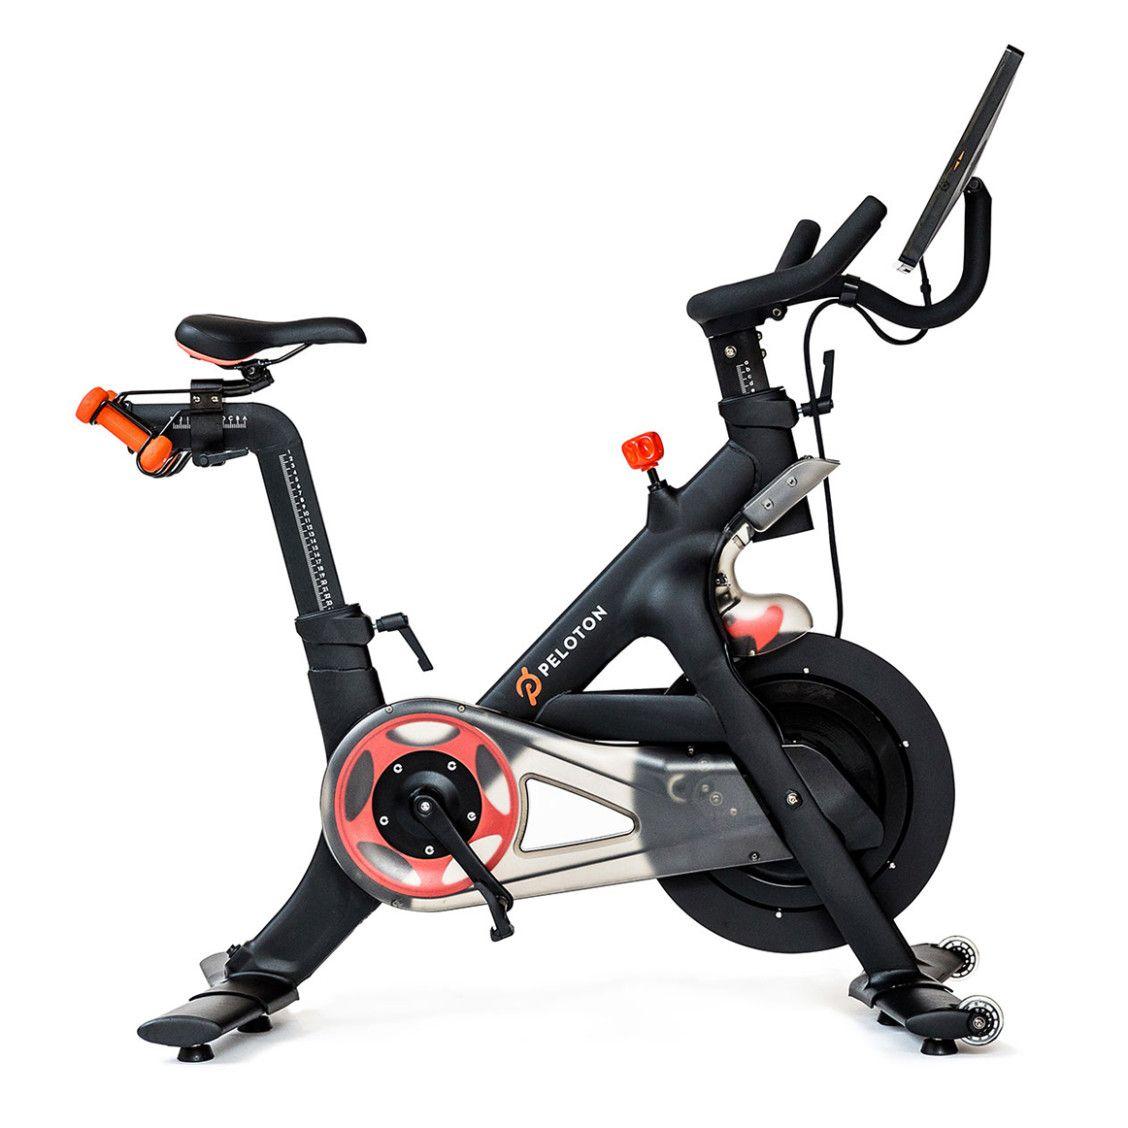 Peloton Buy The Peloton Bike Indoor Bike Workouts Biking Workout